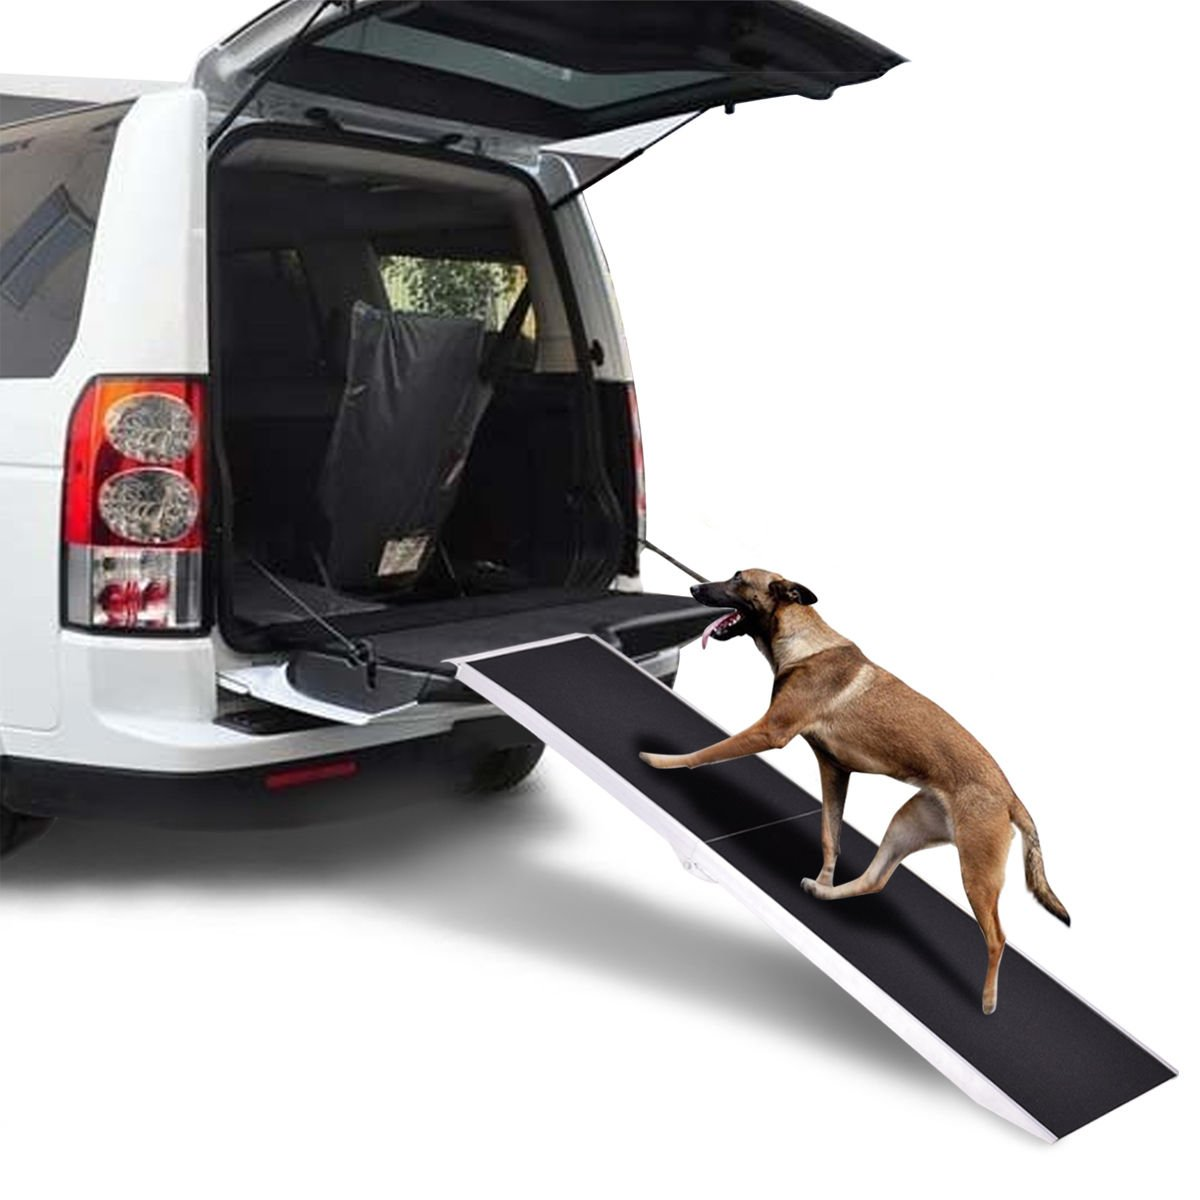 6Ft Portable Aluminum Folding Pet Paw Safe Dog Ramp Ladder Incline Car Truck SUV